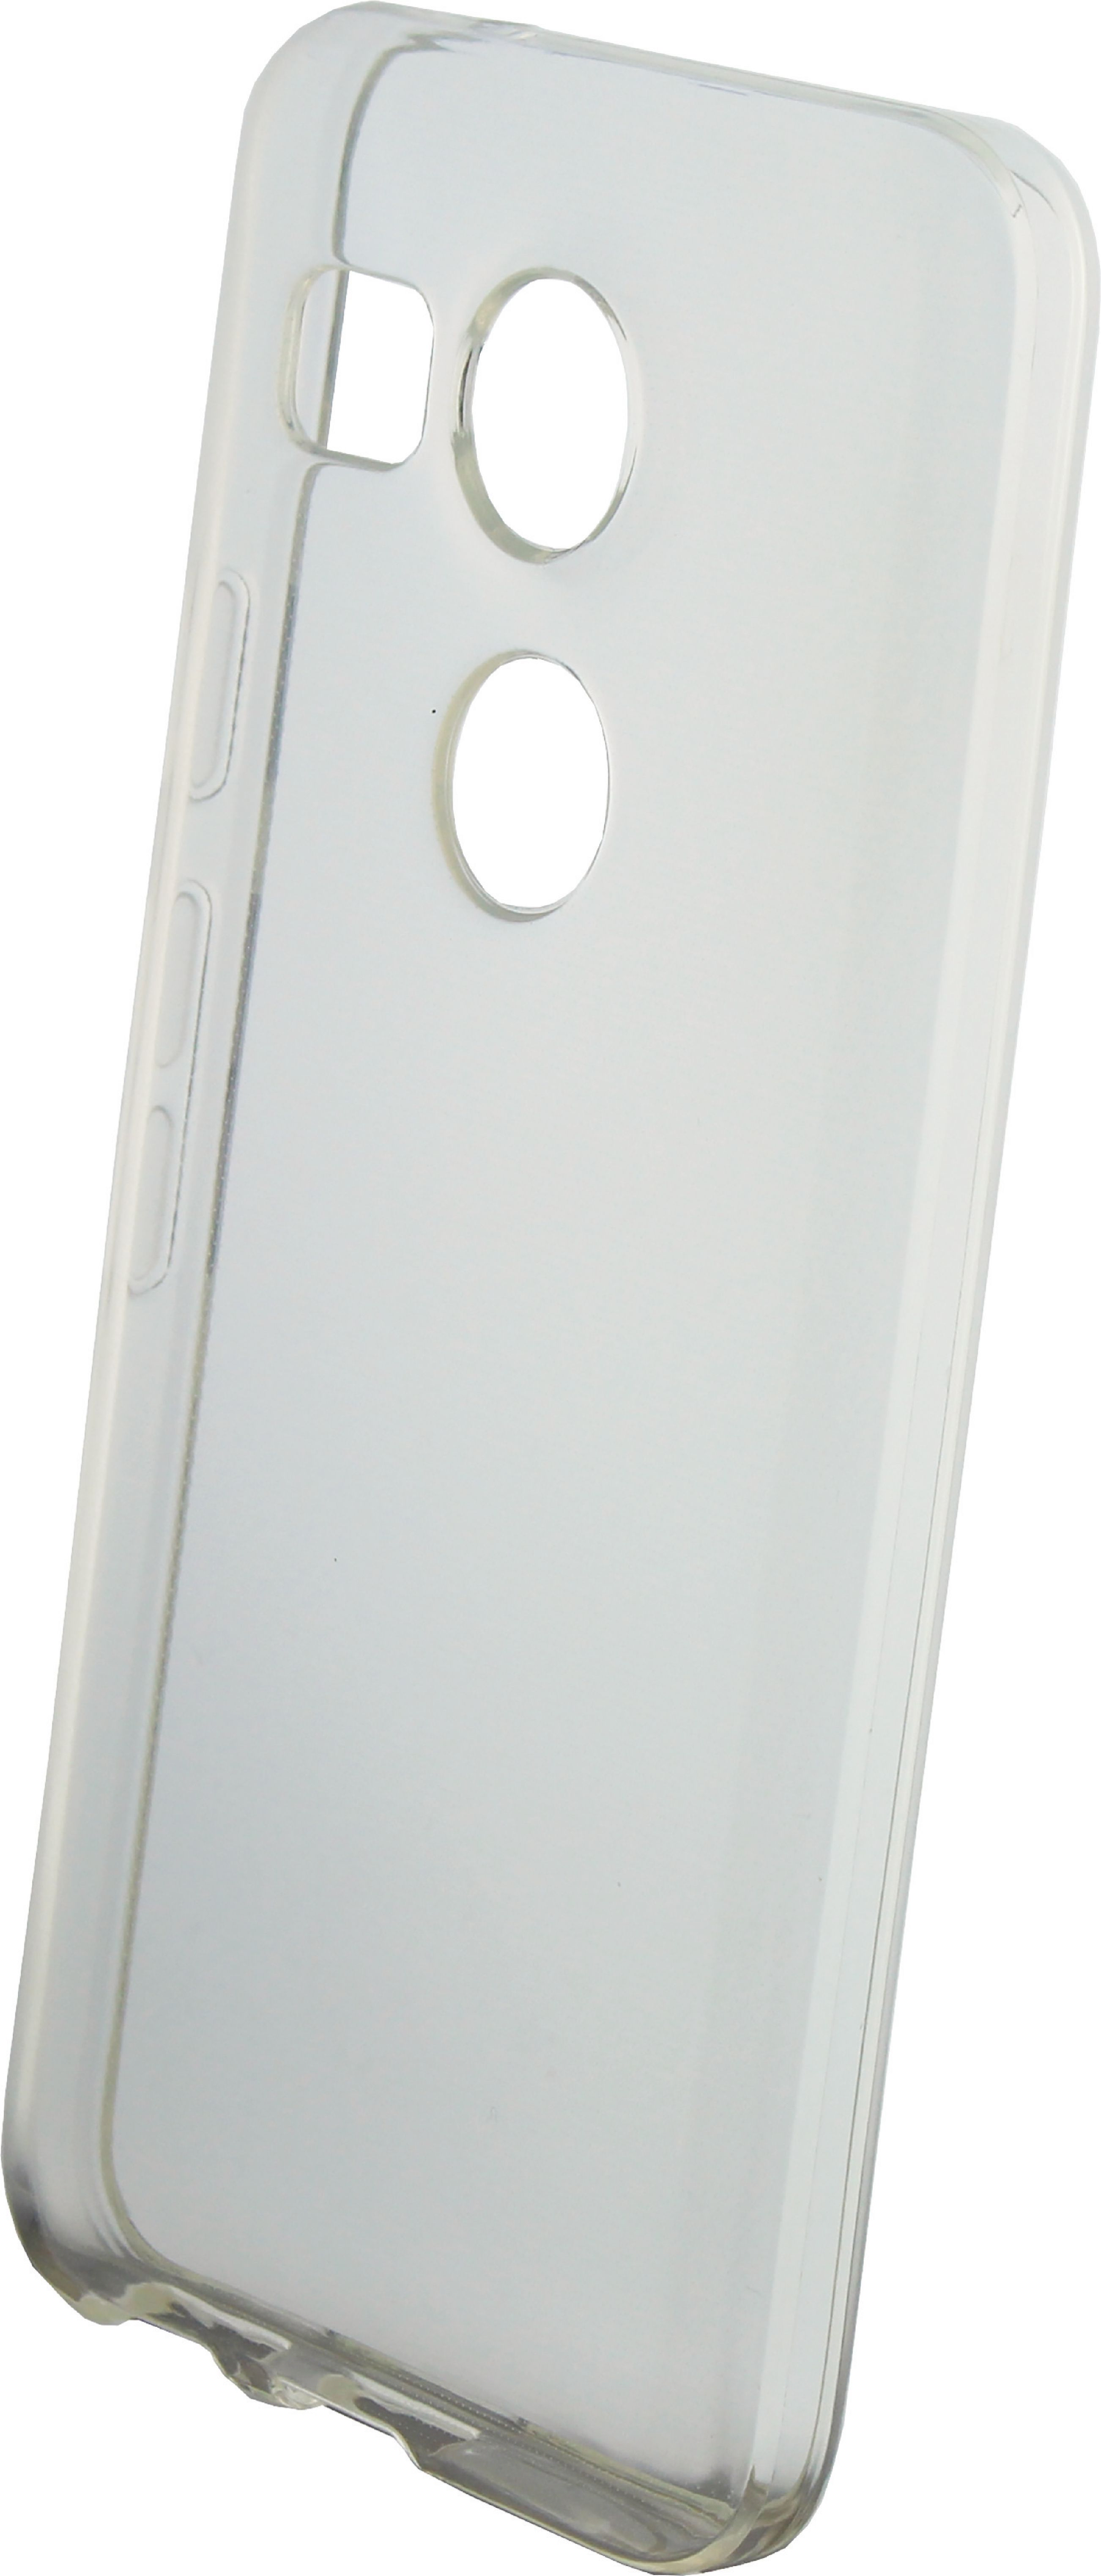 Image of   Telefon Gel-Etui LG Google Nexus 5X Gennemsigtig